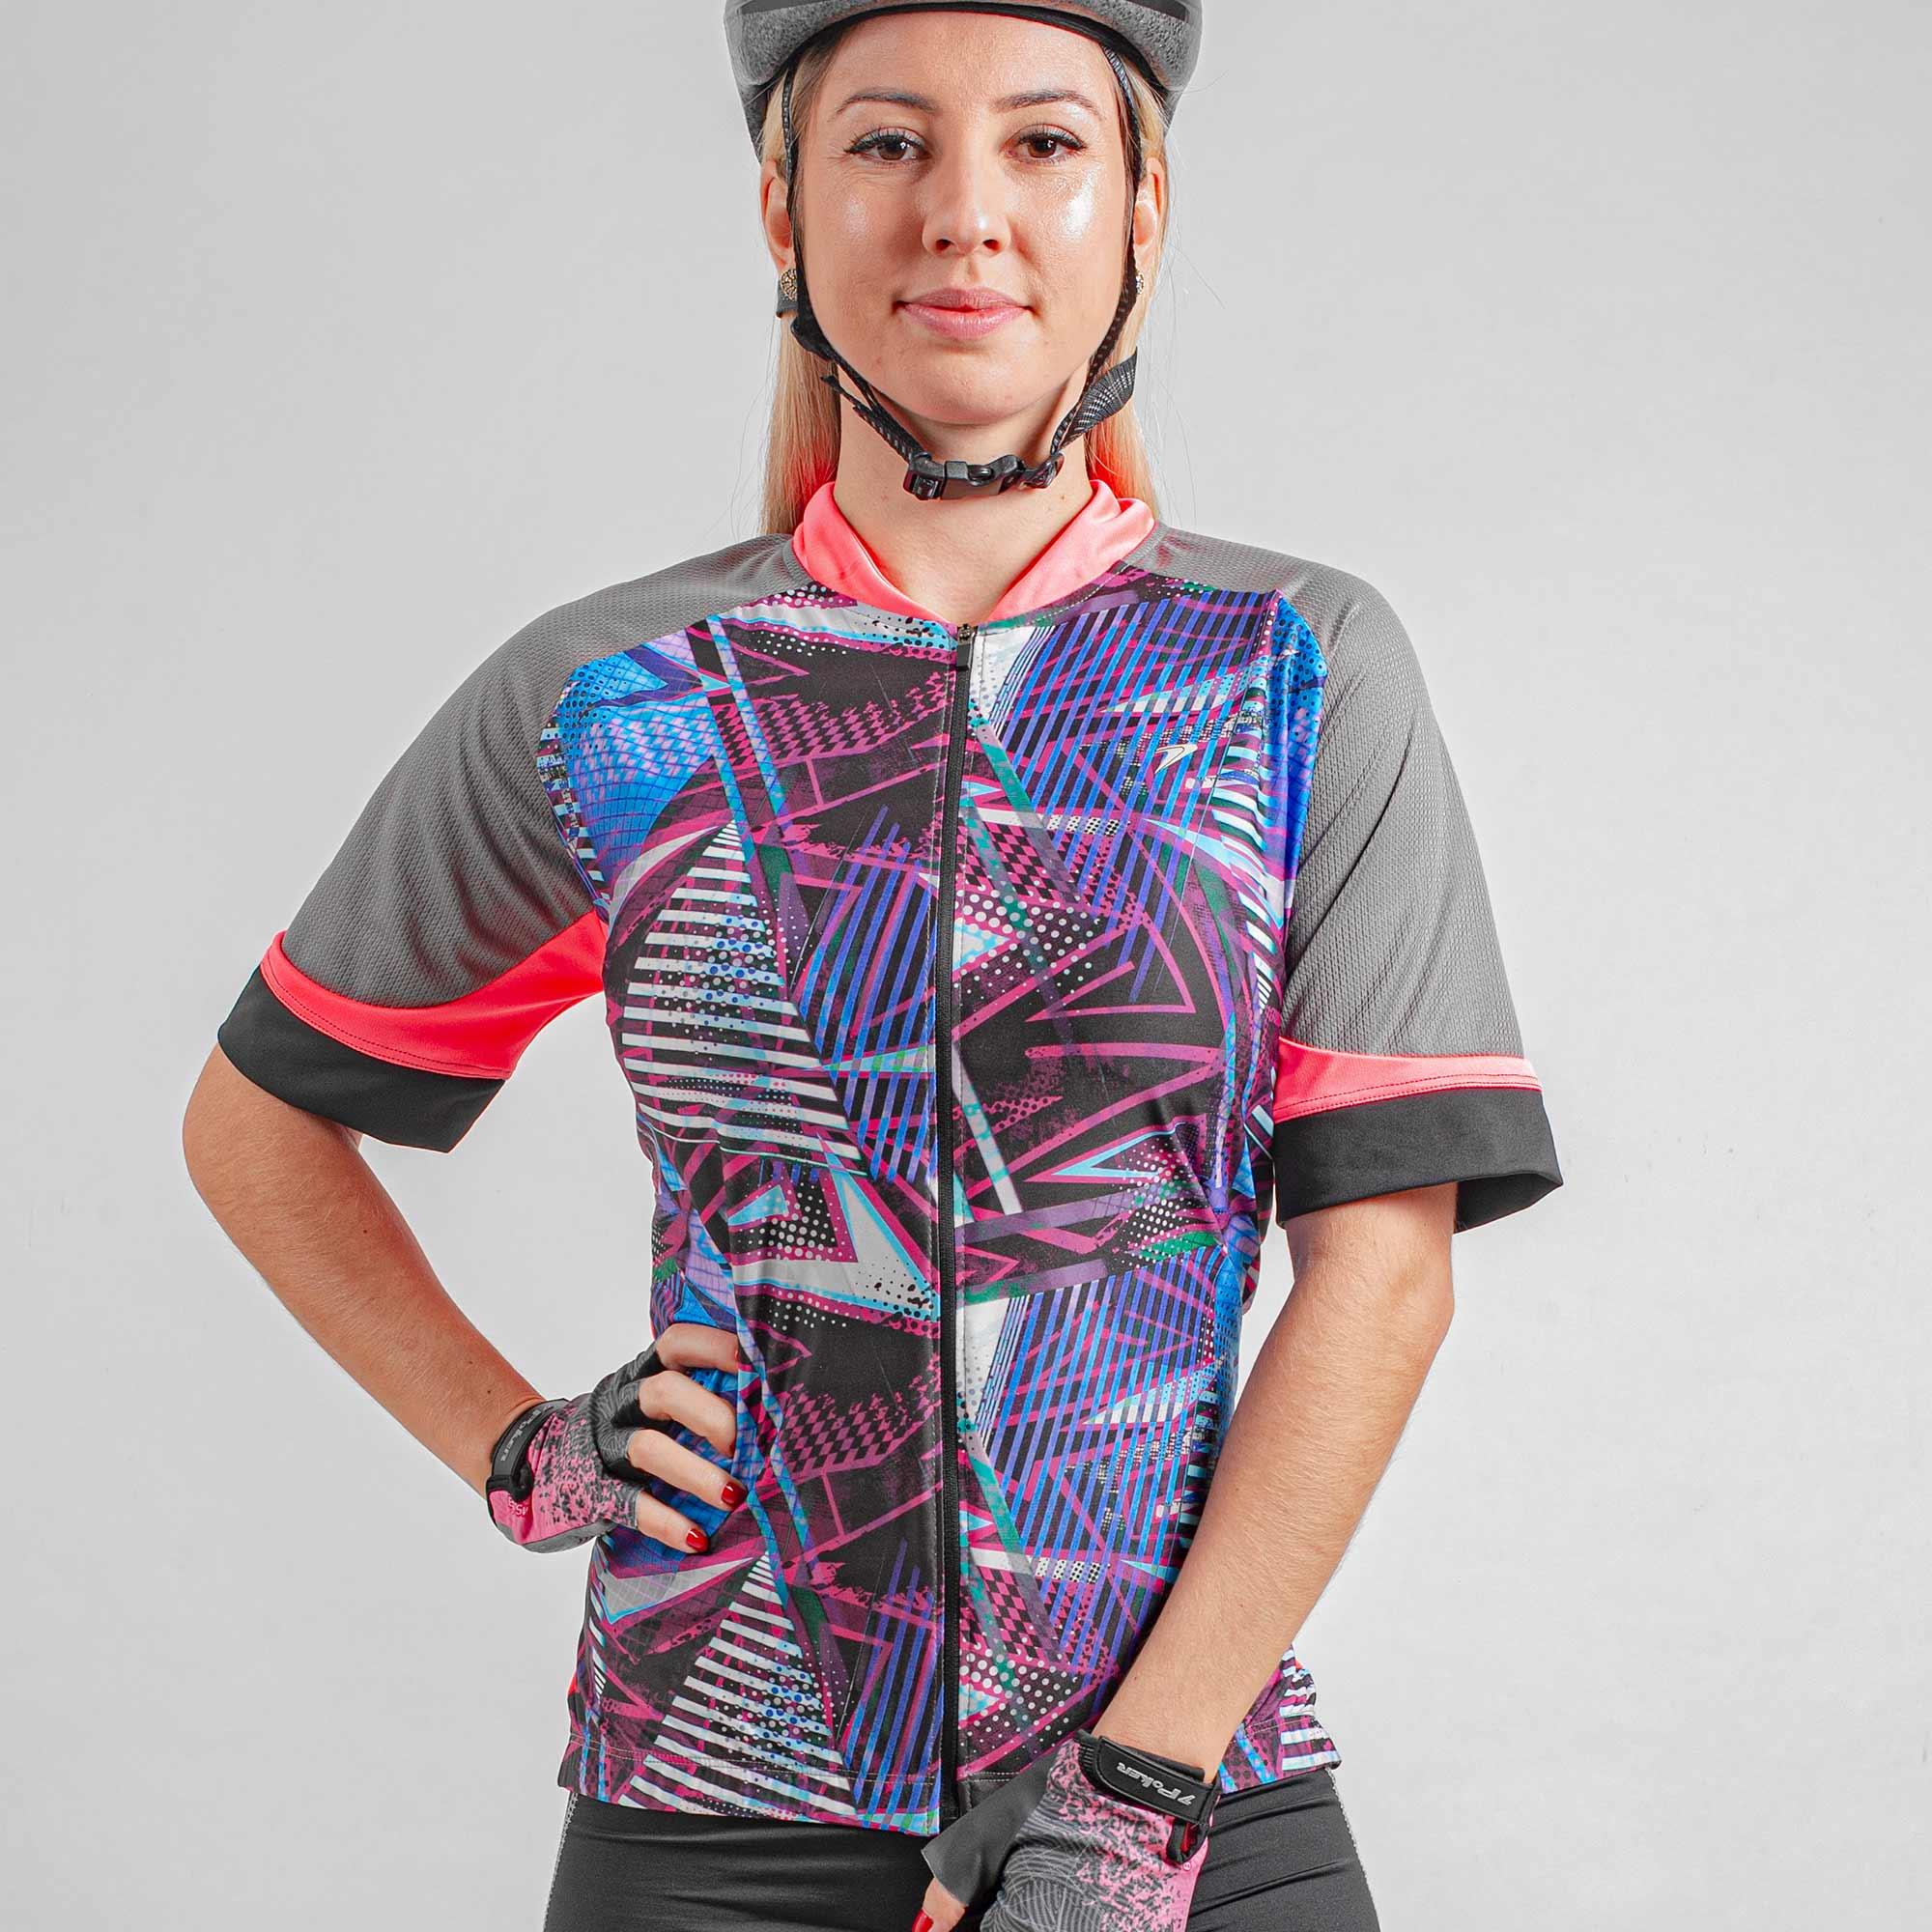 Camisa Ciclista Manga Curta Zíper Total Feminina Jewel II 04265